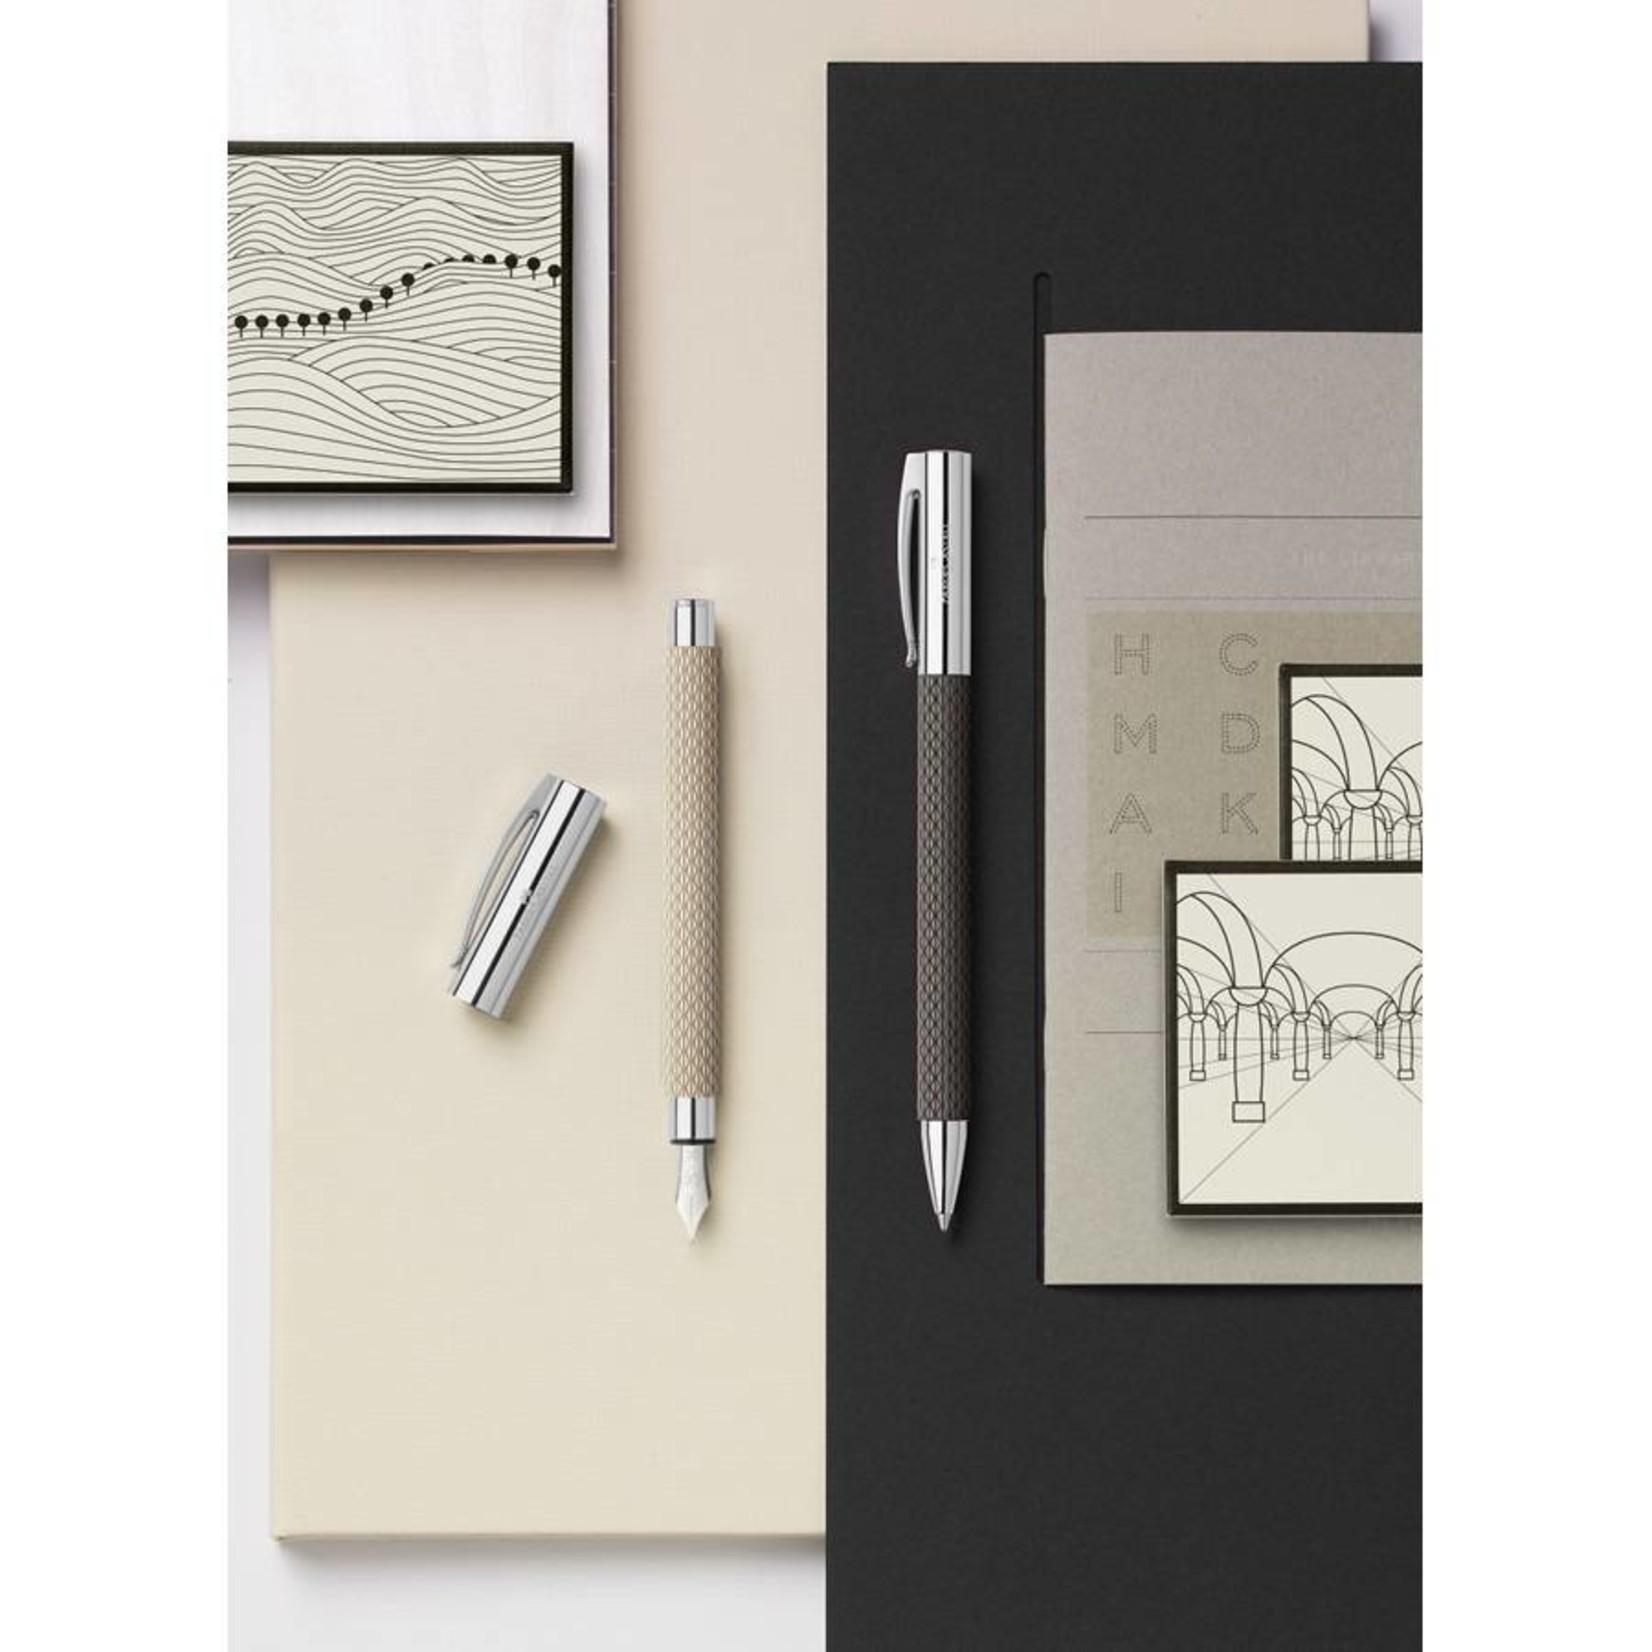 Faber-Castell AMBITION Kugelschreiber OpArt White Sand